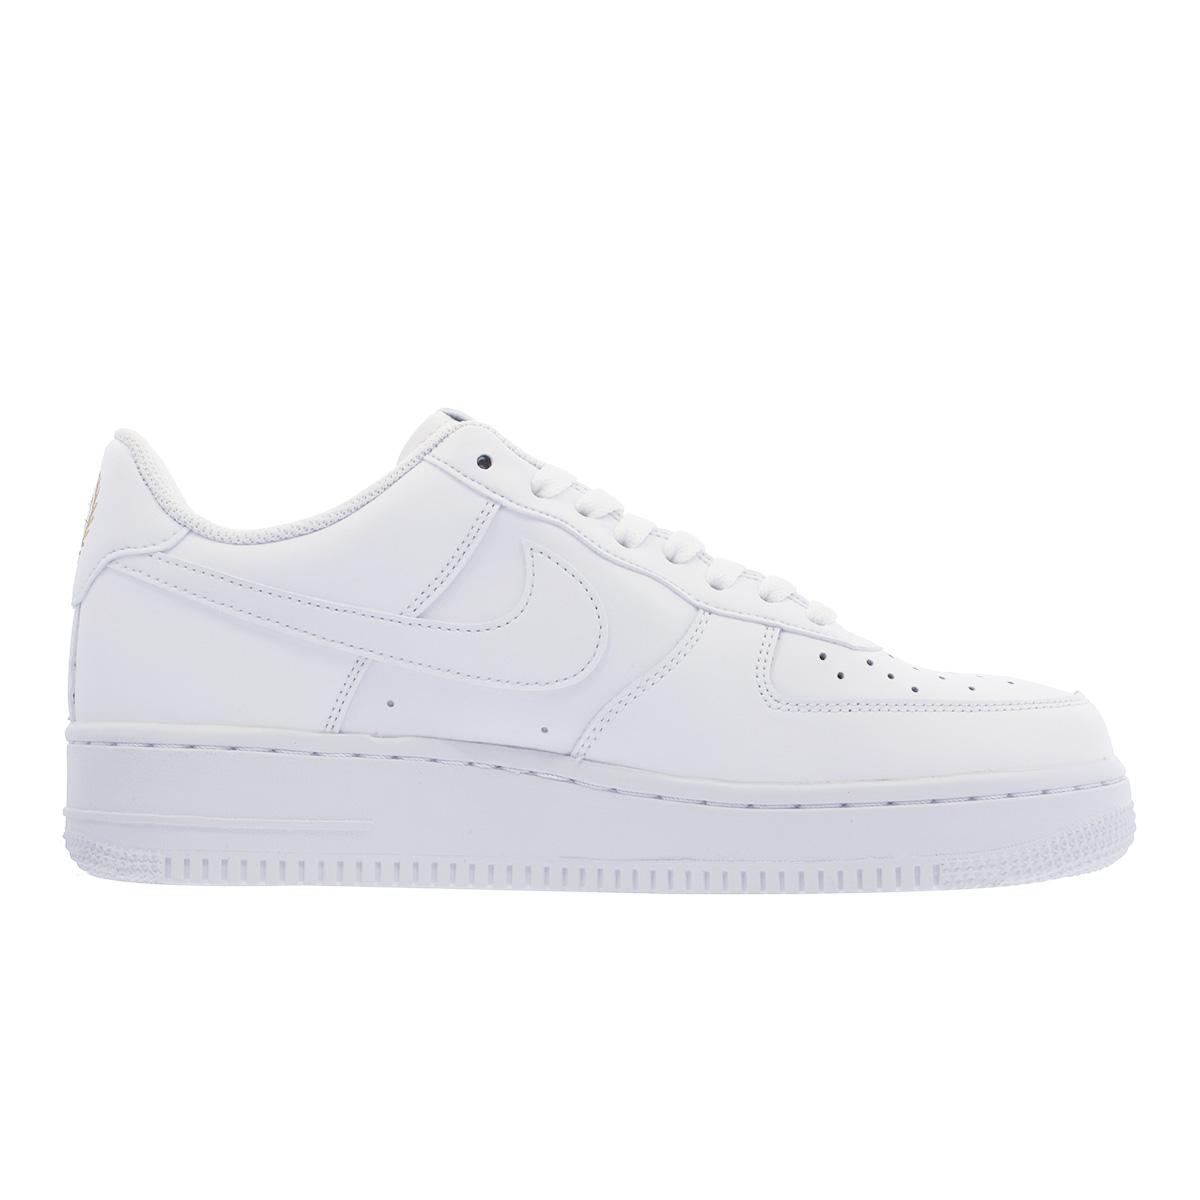 2436ae225a05 NIKE AIR FORCE 1  07 Nike air force 1  07 WHITE METALLIC GOLD aa4083-102